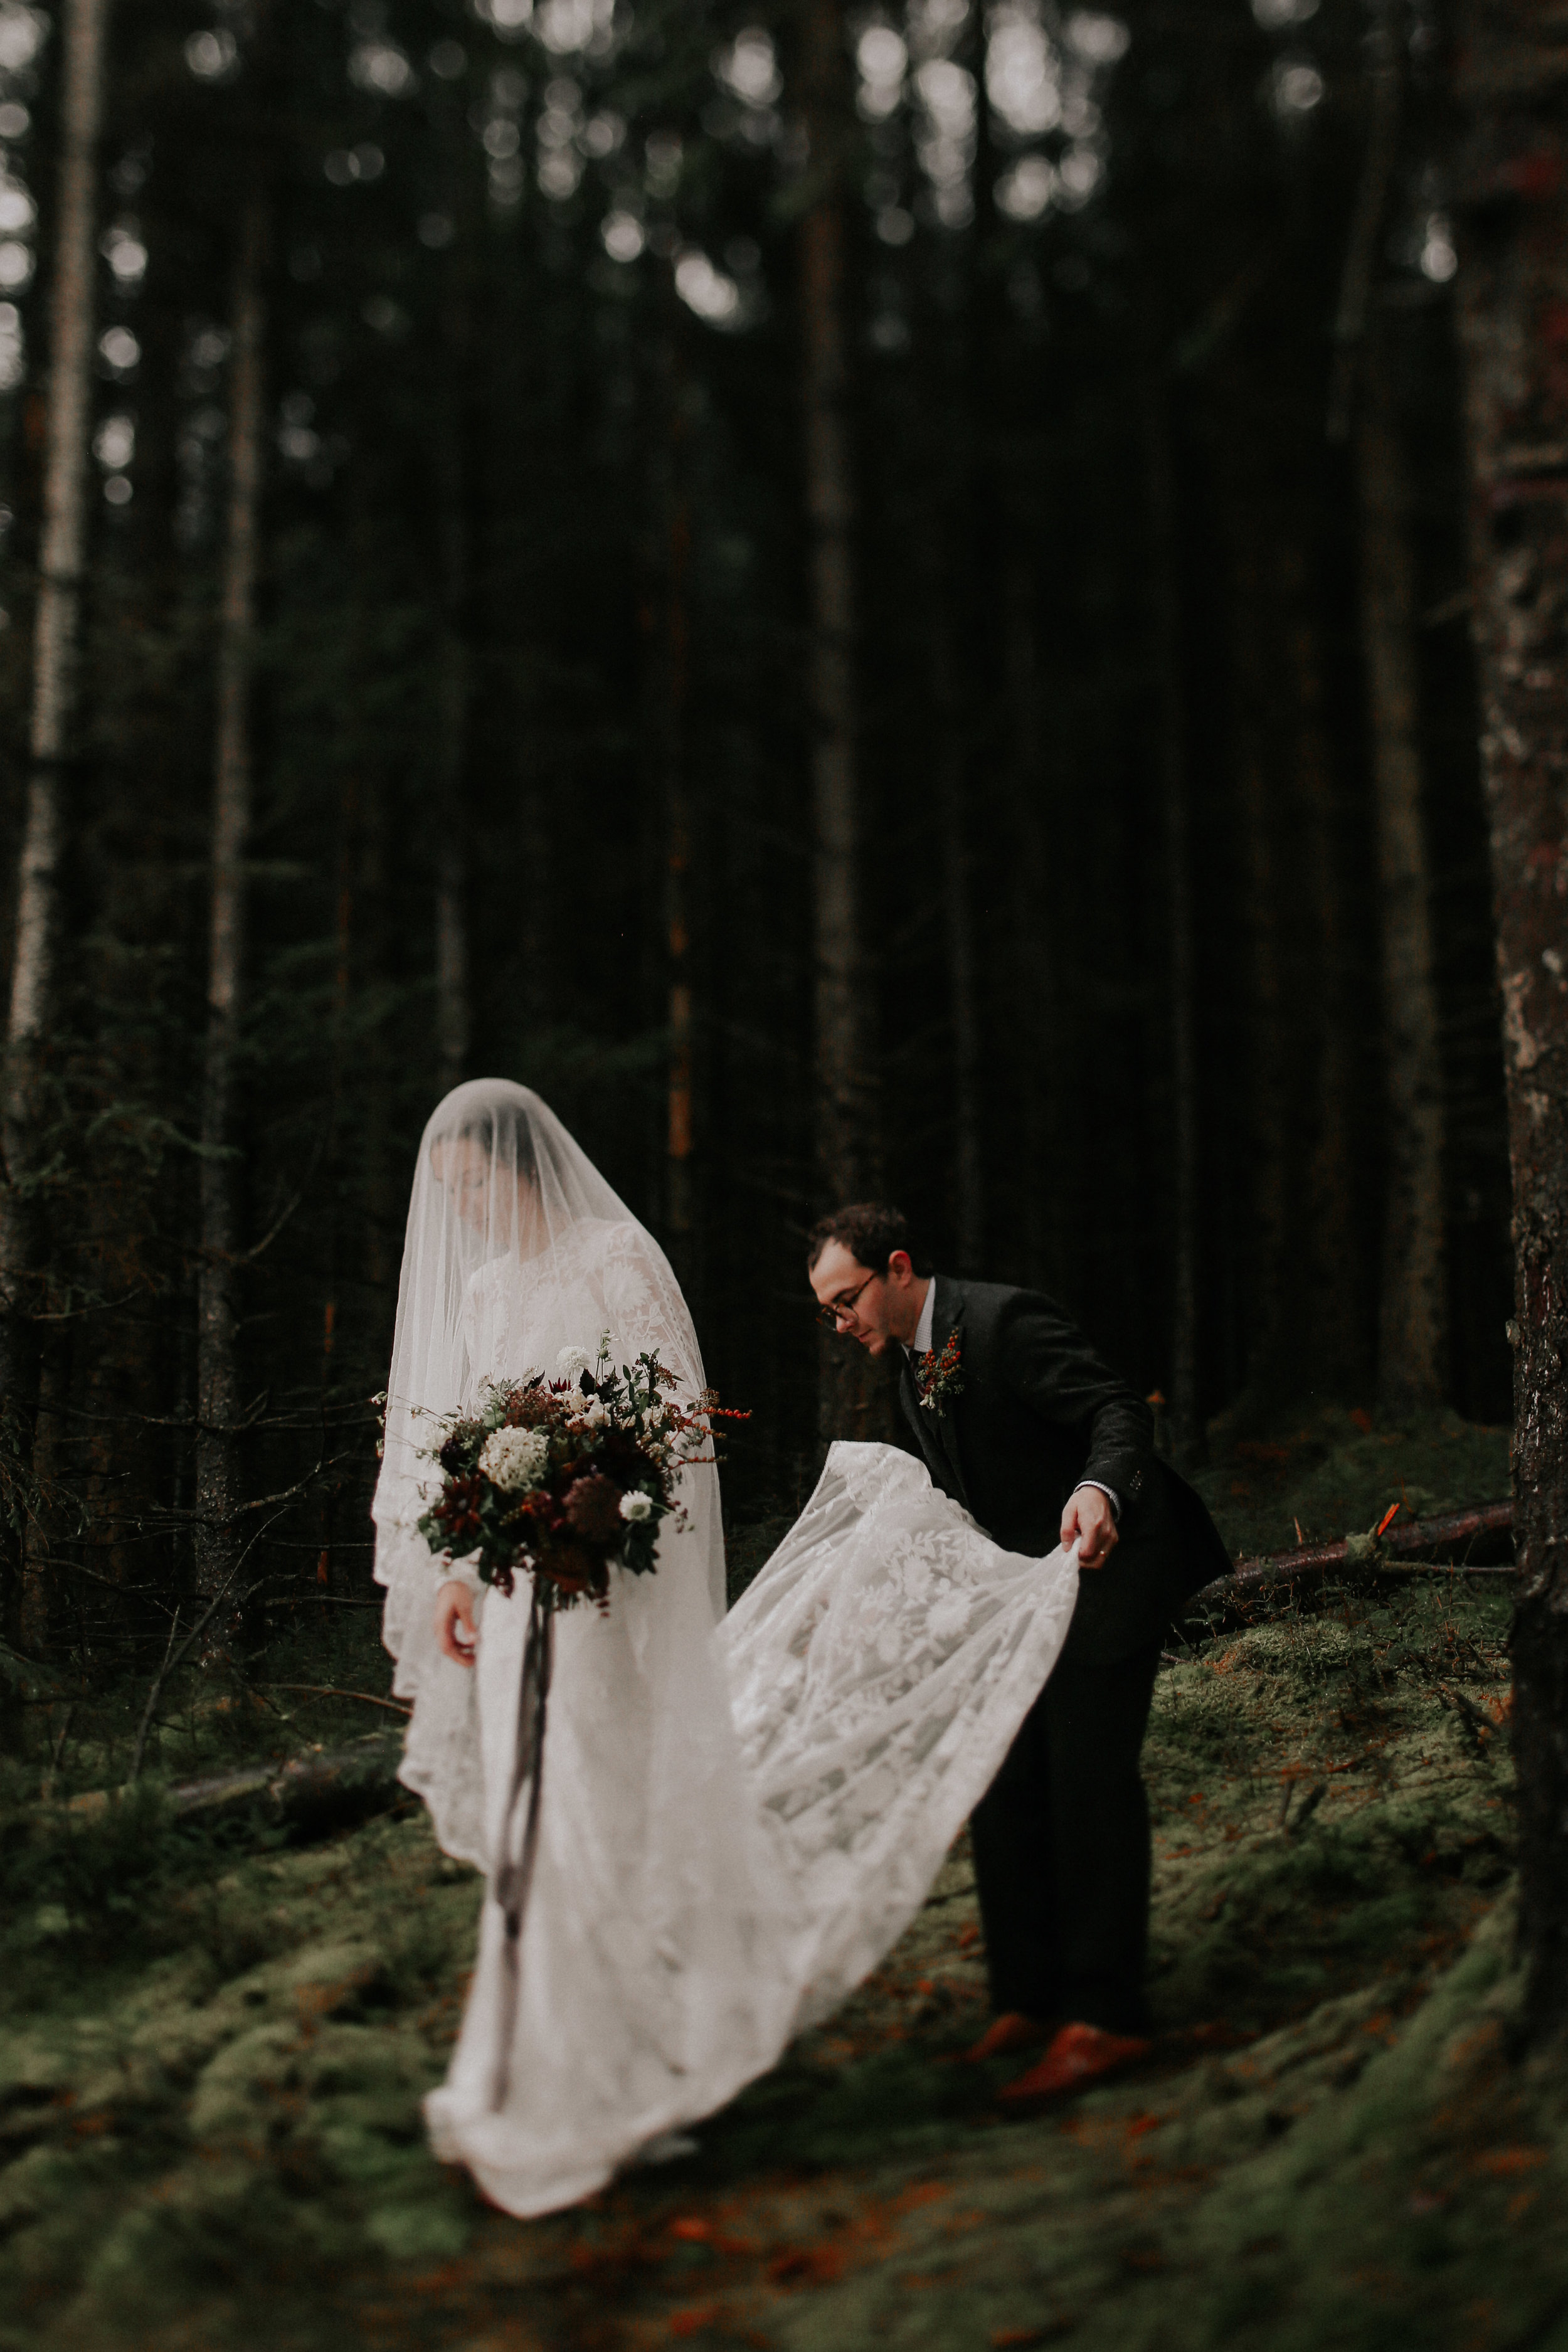 Scotland_Elopement_Melissa_Marshall_Photography_33.jpg